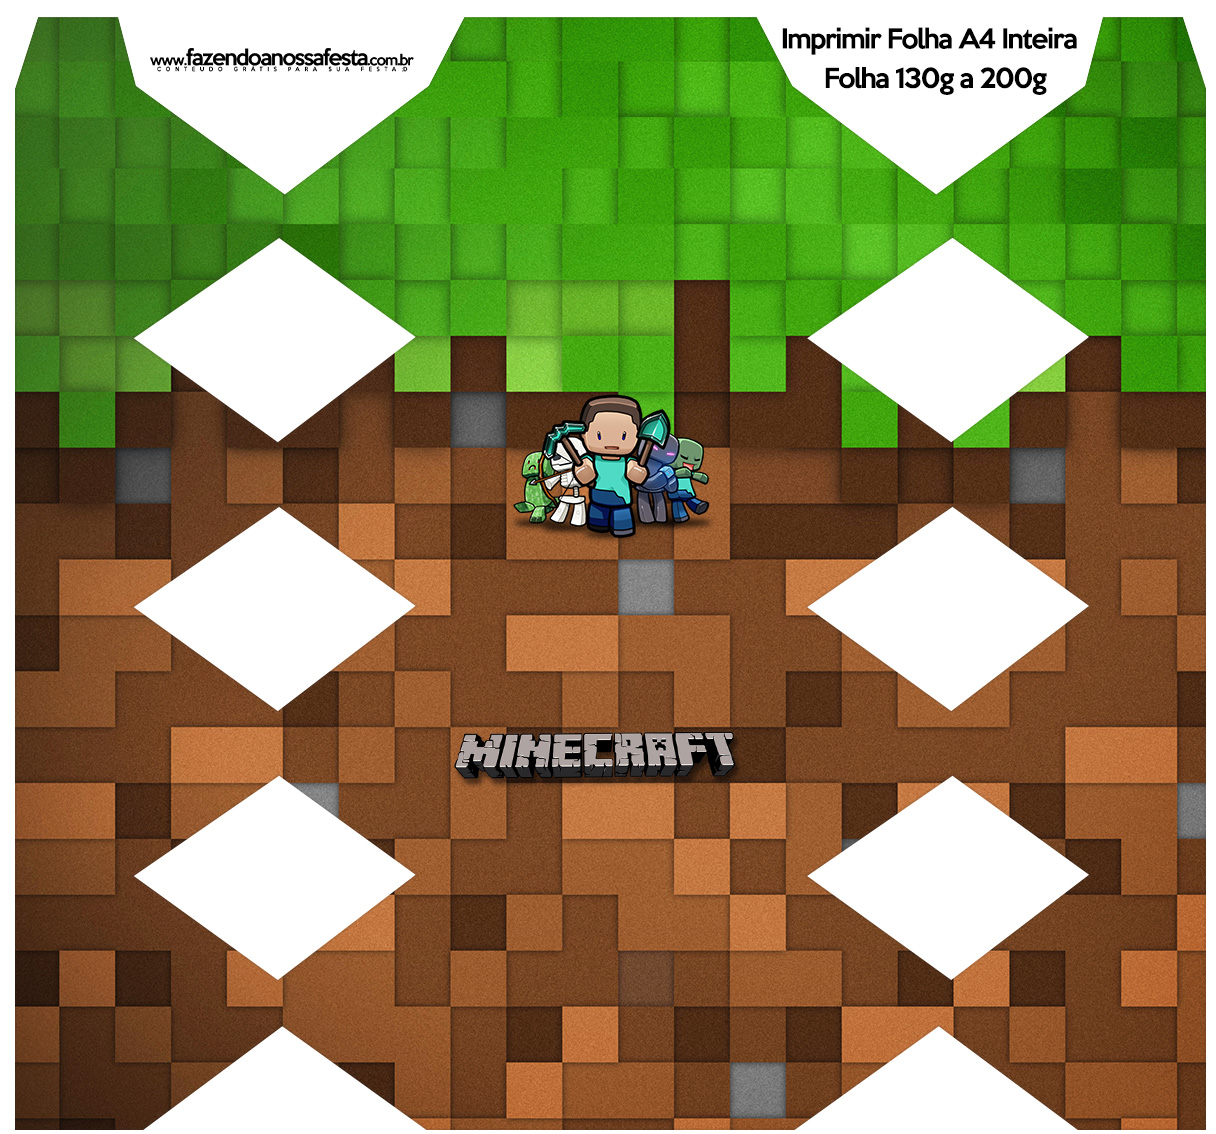 Minecraft Cajas Para Imprimir Gratis Oh My Fiesta Friki